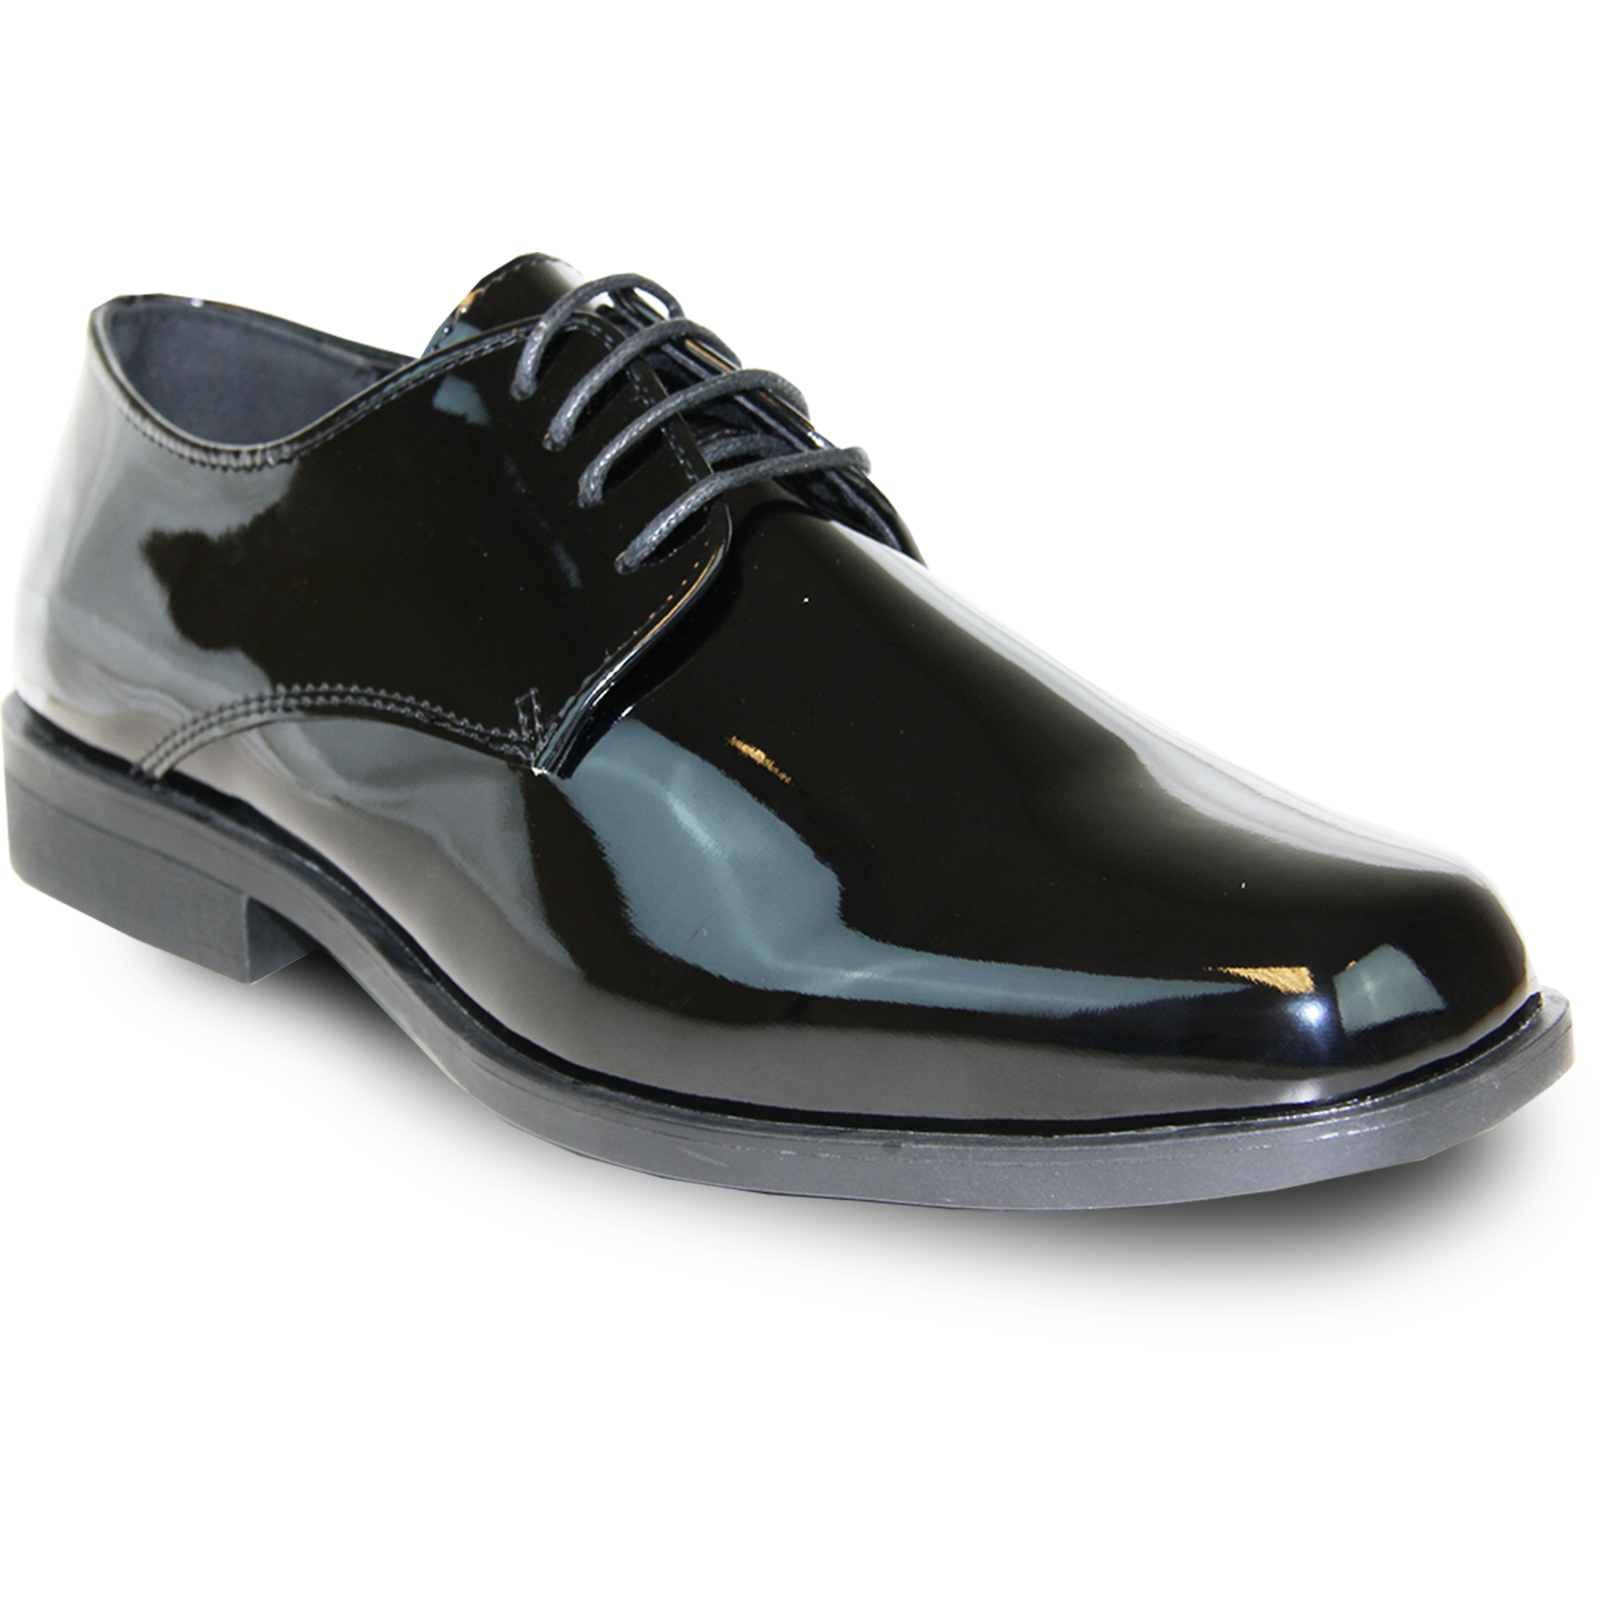 VANGELO Men's Tux-1 Black Patent Dress Oxford - Wide Width Available